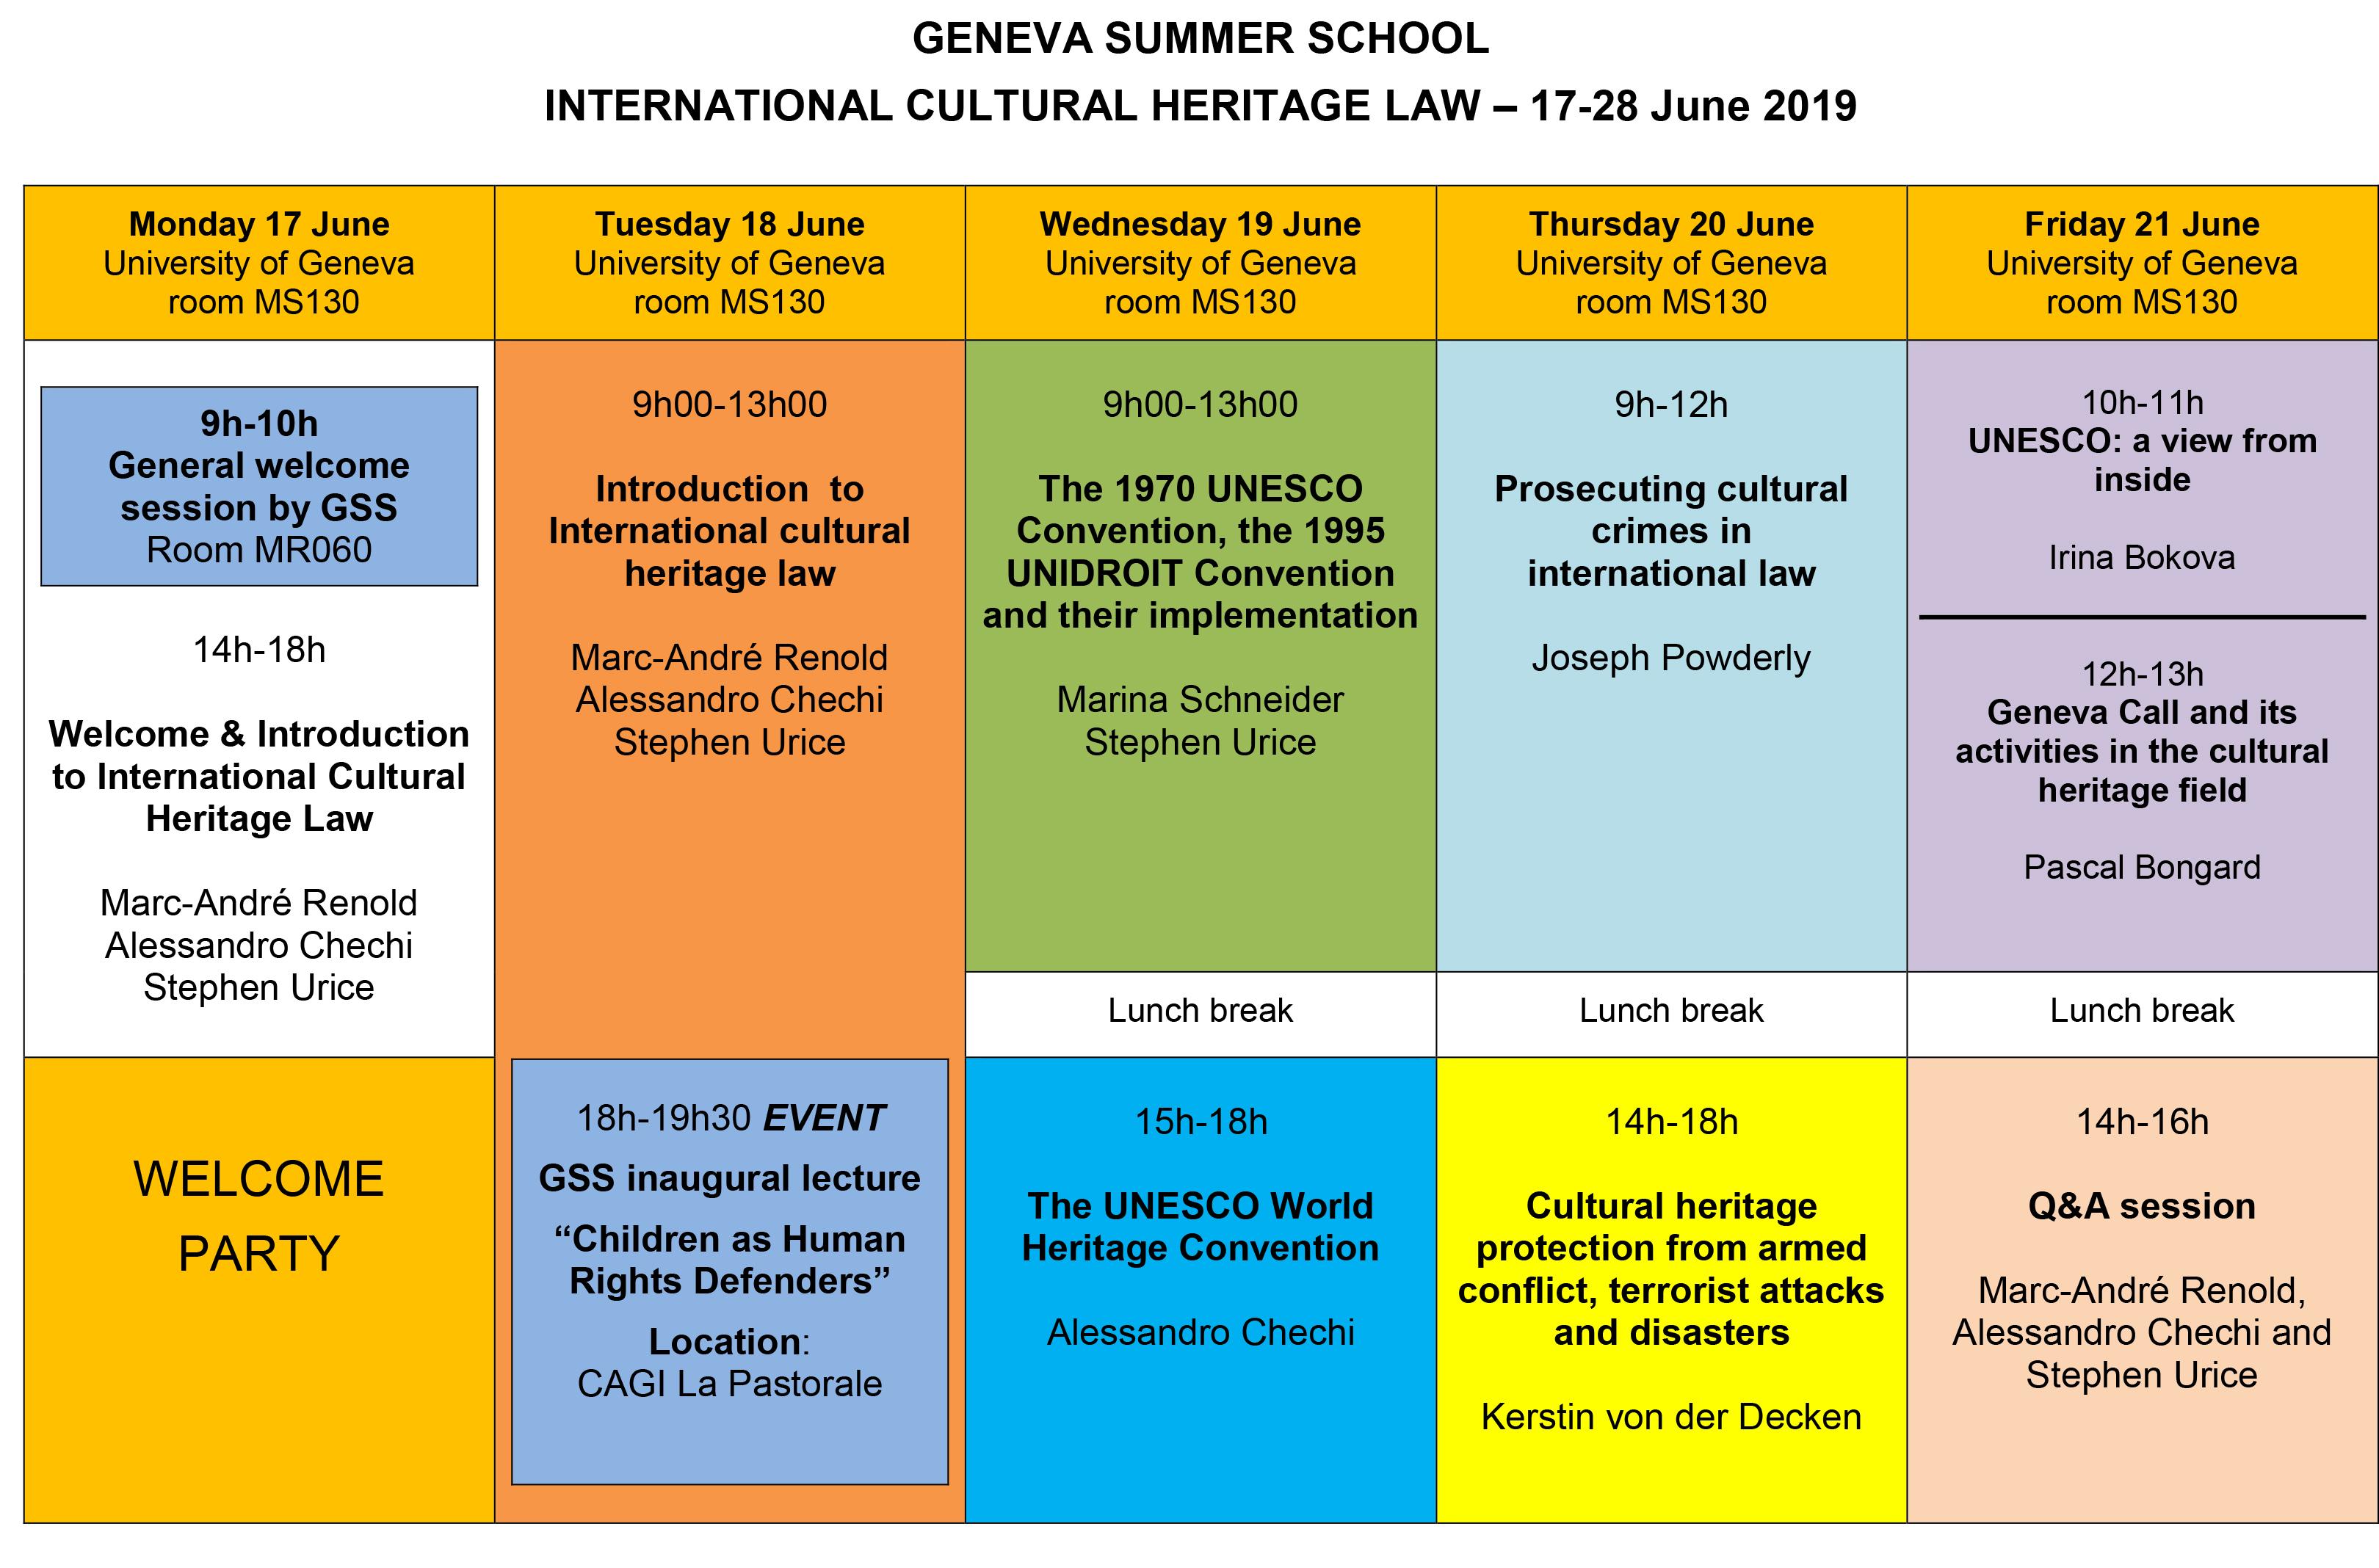 Geneva Summer Schools • International Cultural Heritage Law